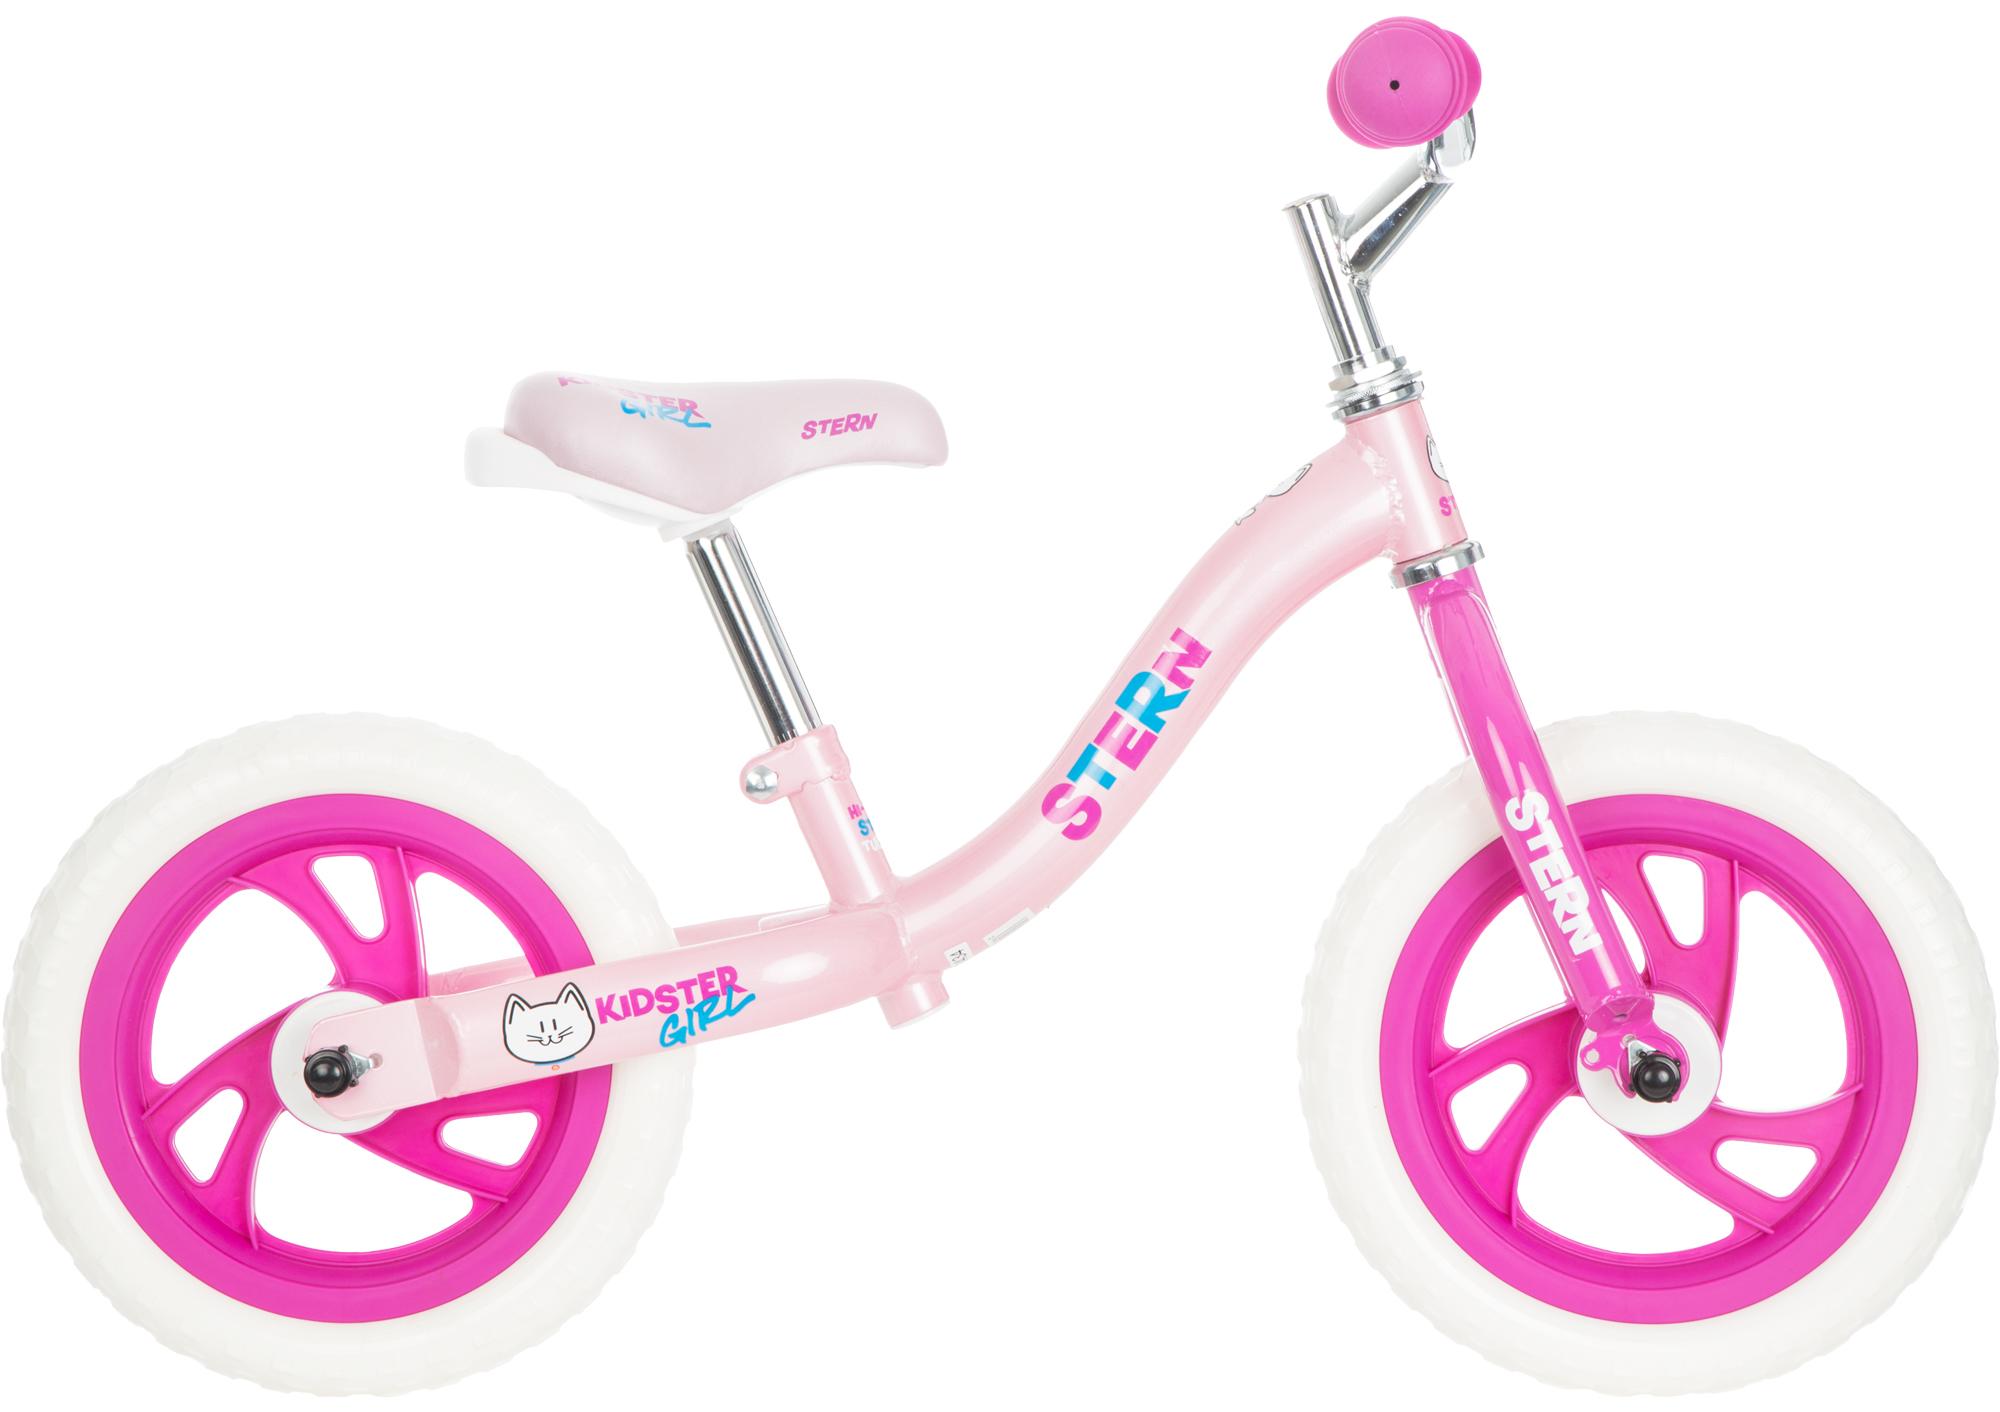 Stern Беговел детский для девочек Stern Kidster Girl 12 беговел bradex беговел с колесом в виде мяча велоболл